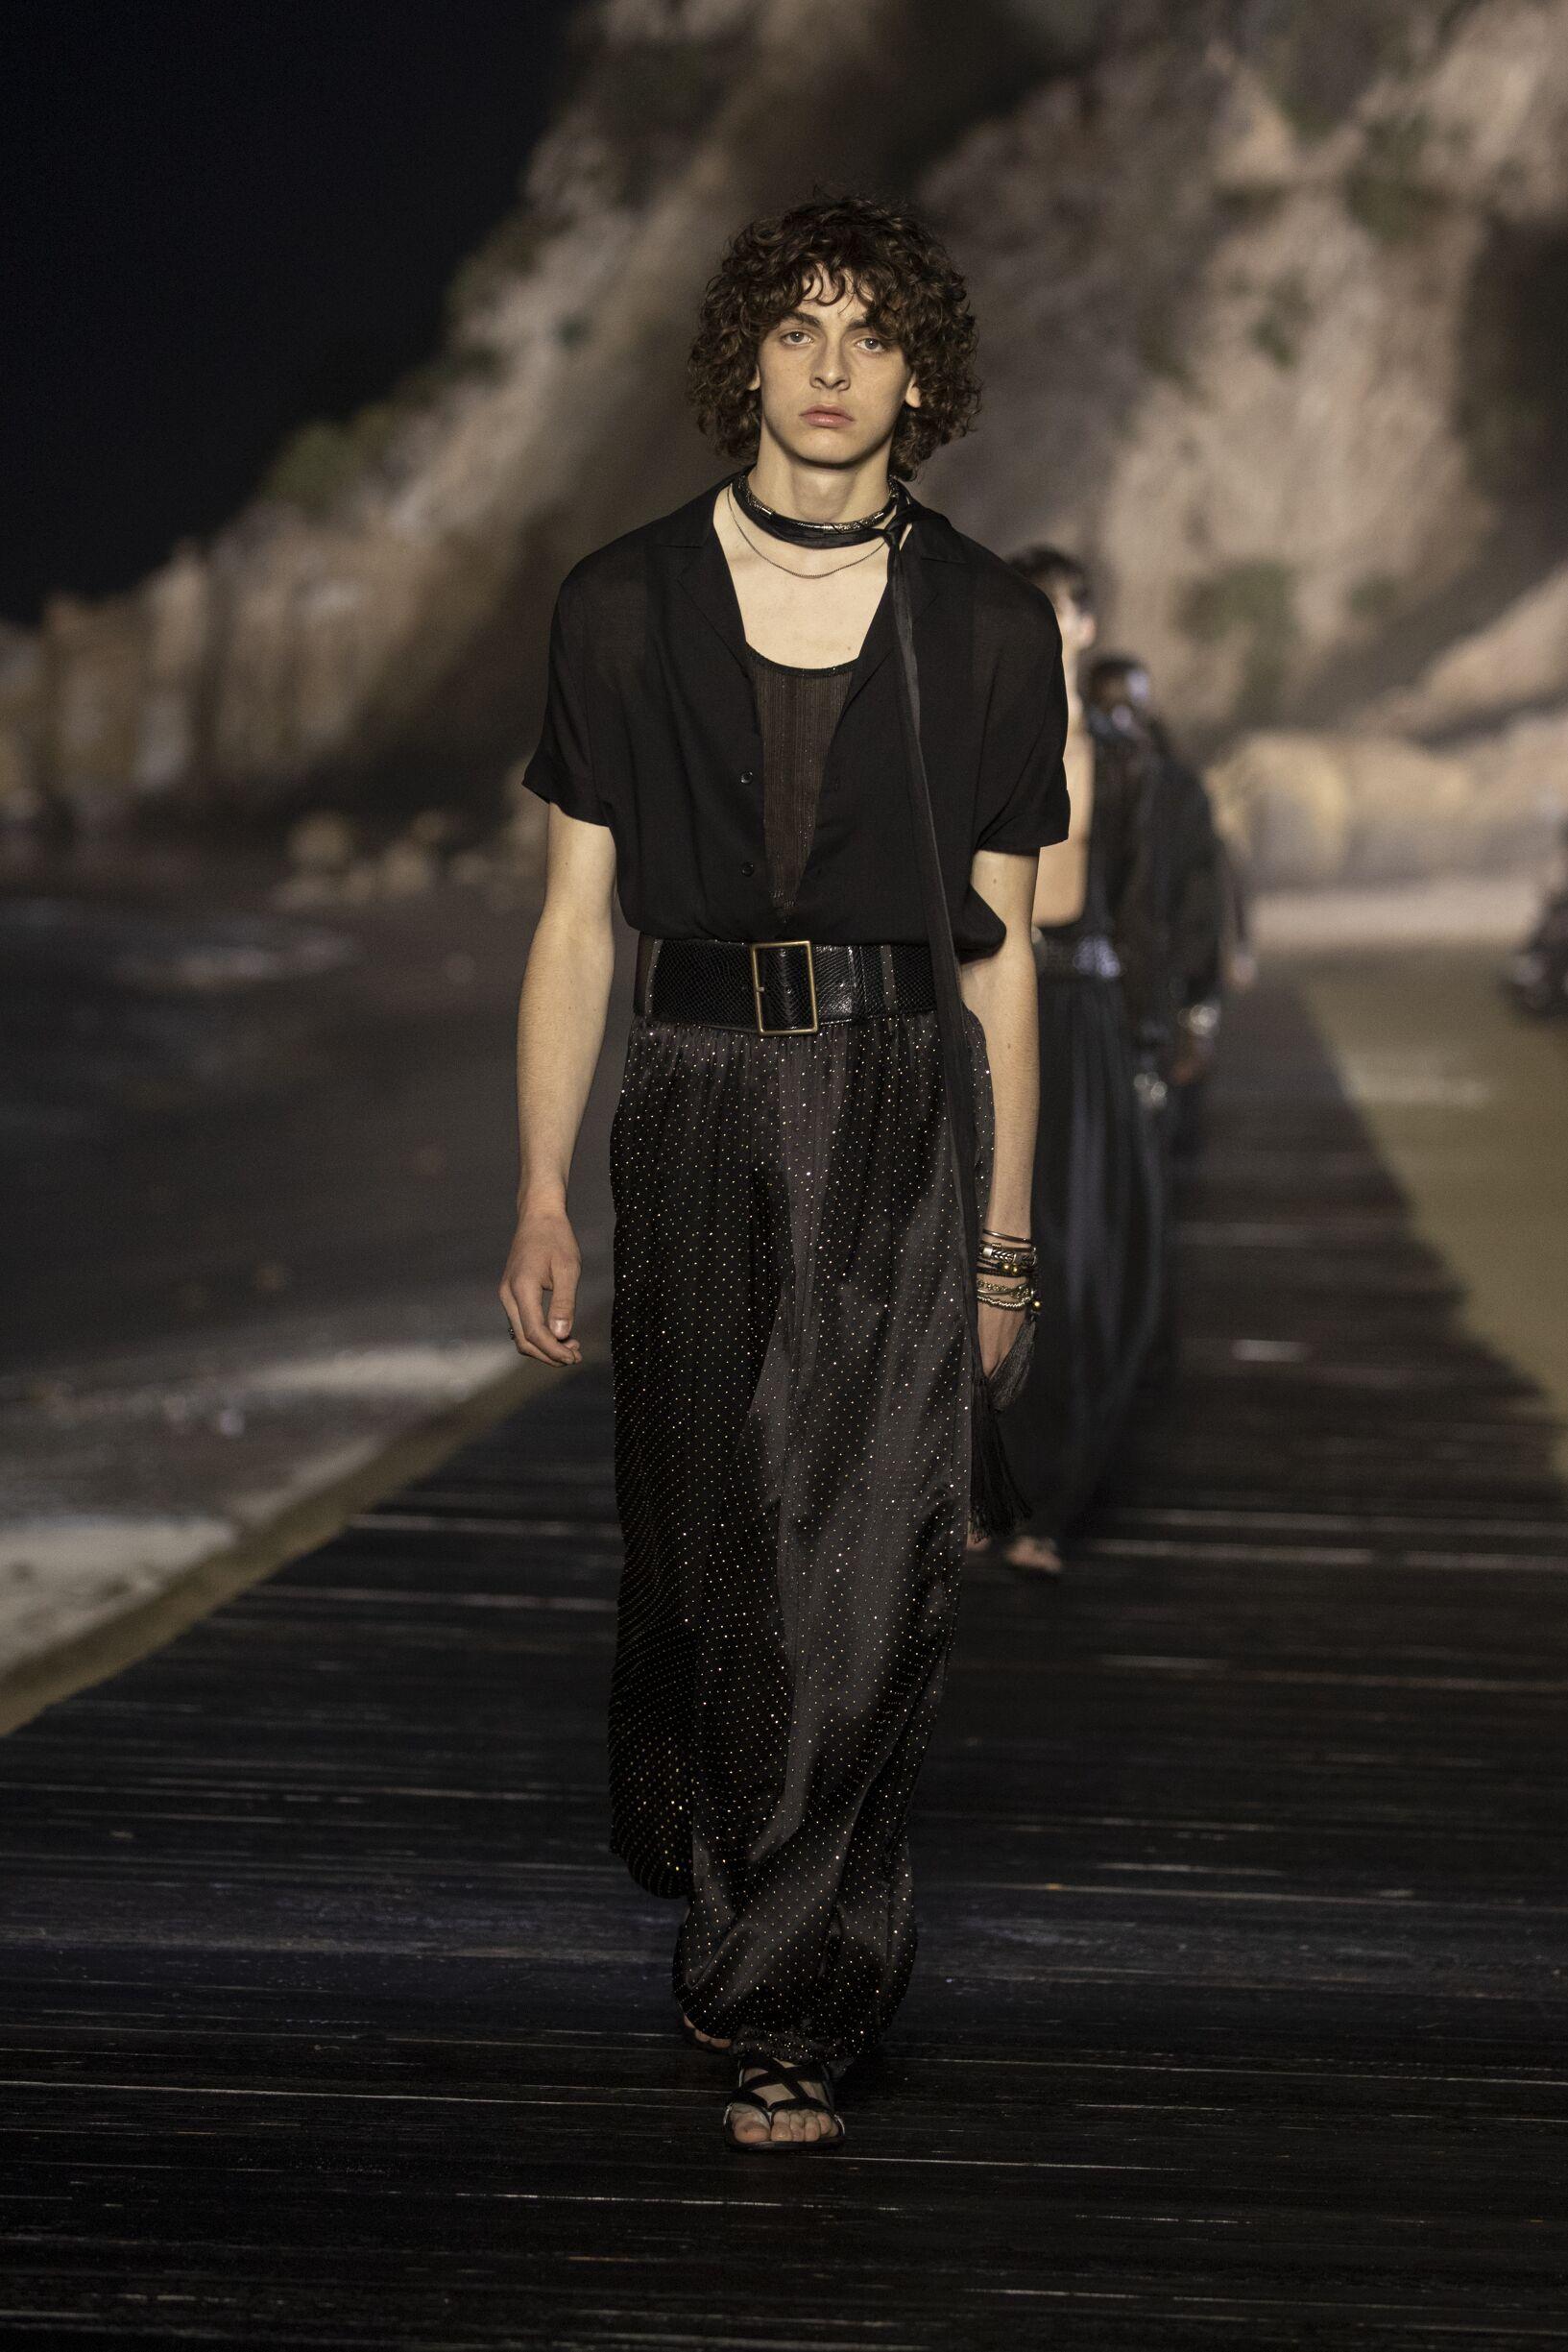 Saint Laurent Menswear Collection Style